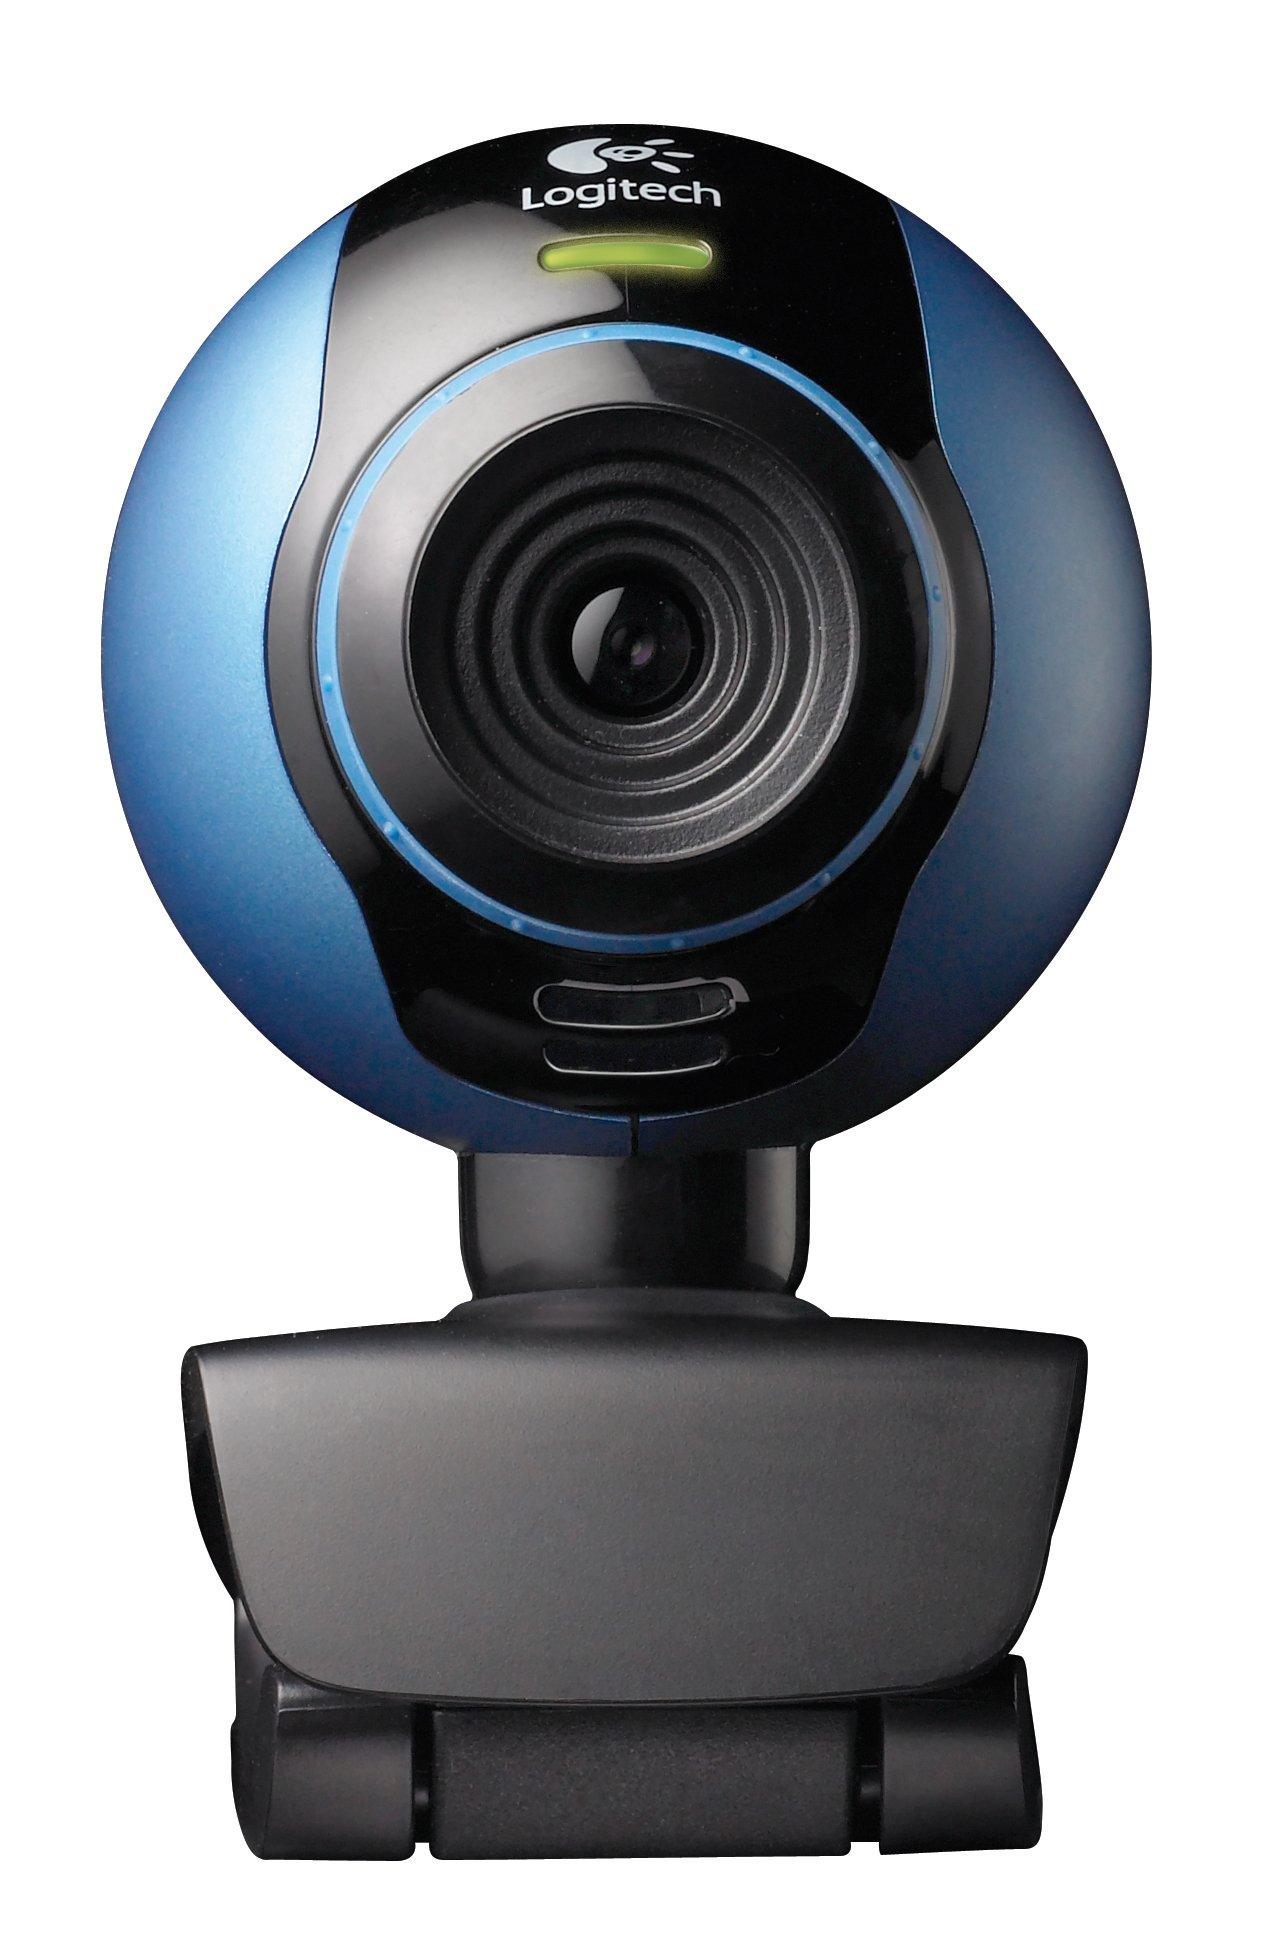 Logitech Webcam C250 (Peacock Blue) by Logitech